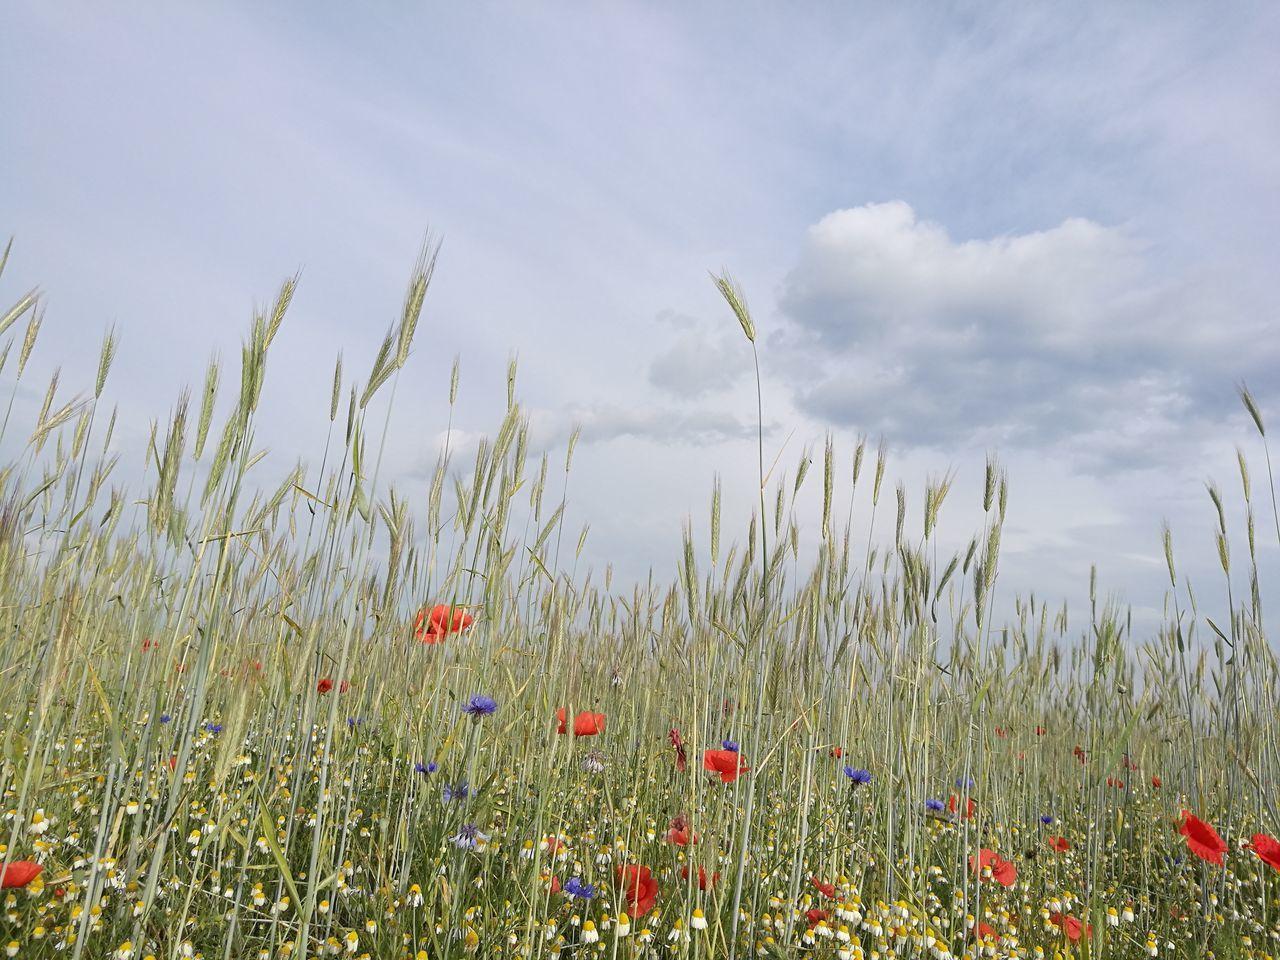 Poppy Flowers Blooming On Field Against Sky